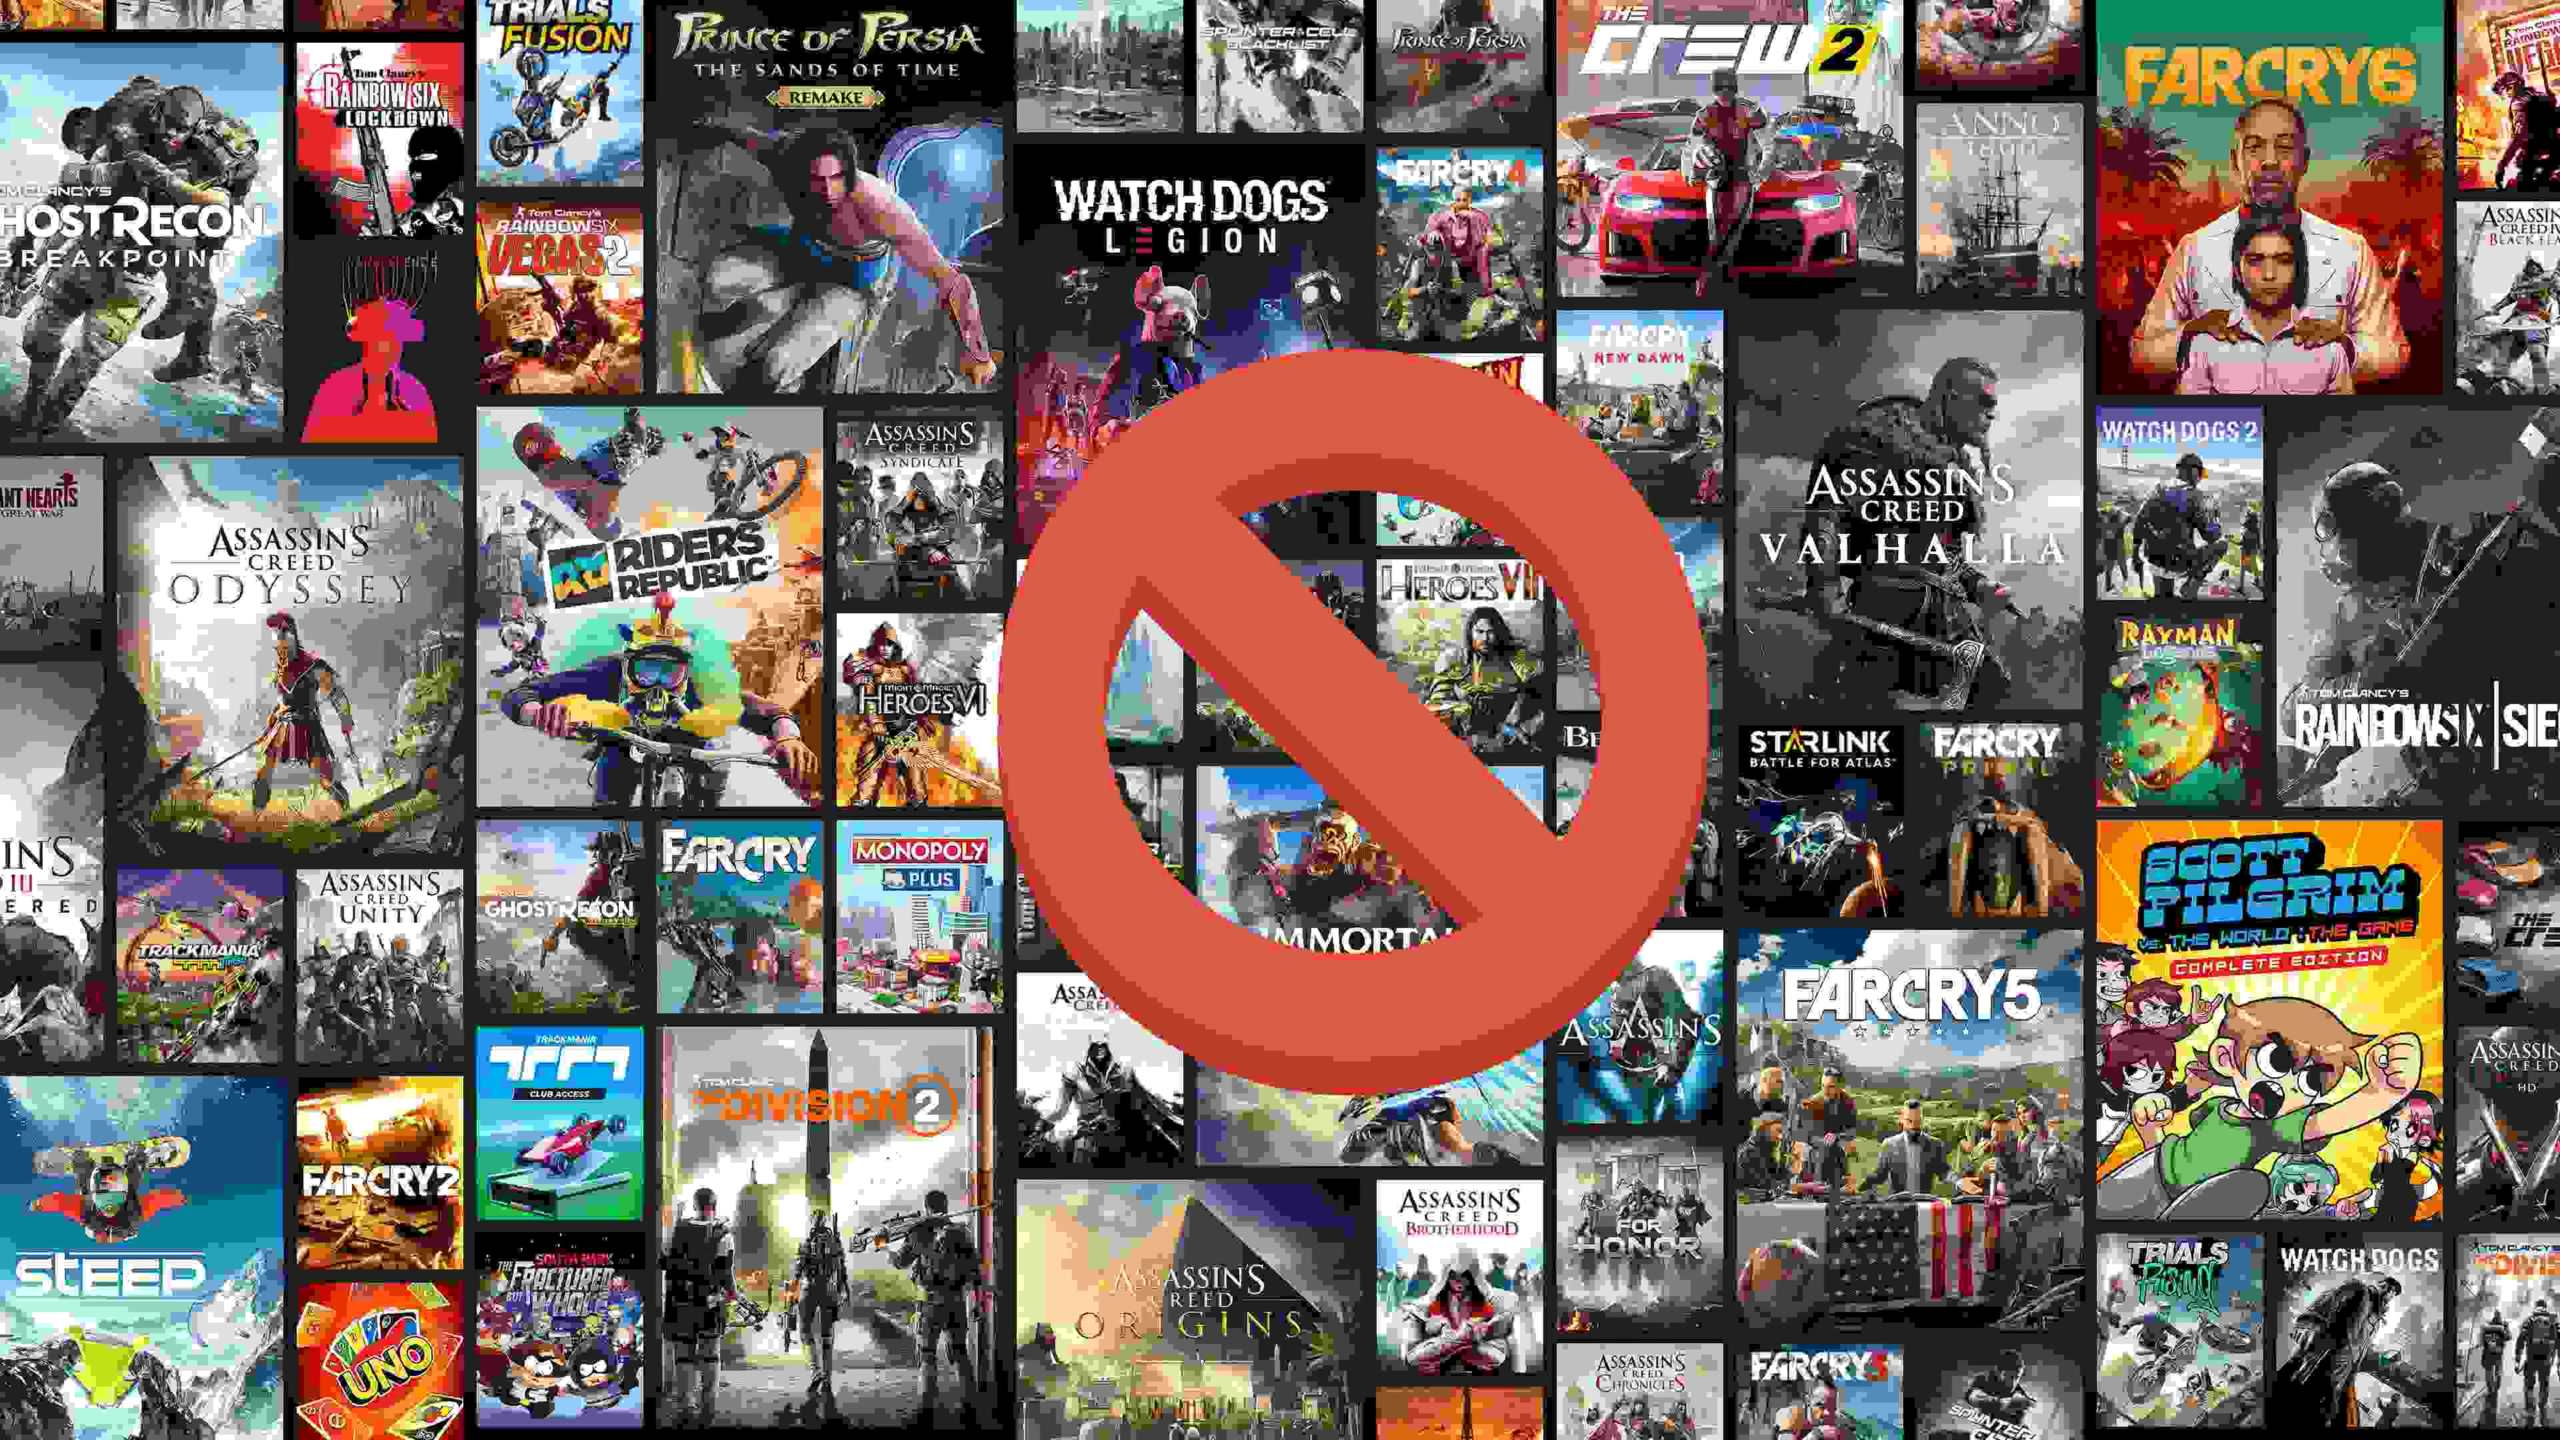 Ubisoft shock non punta più sui tripla A - copertina